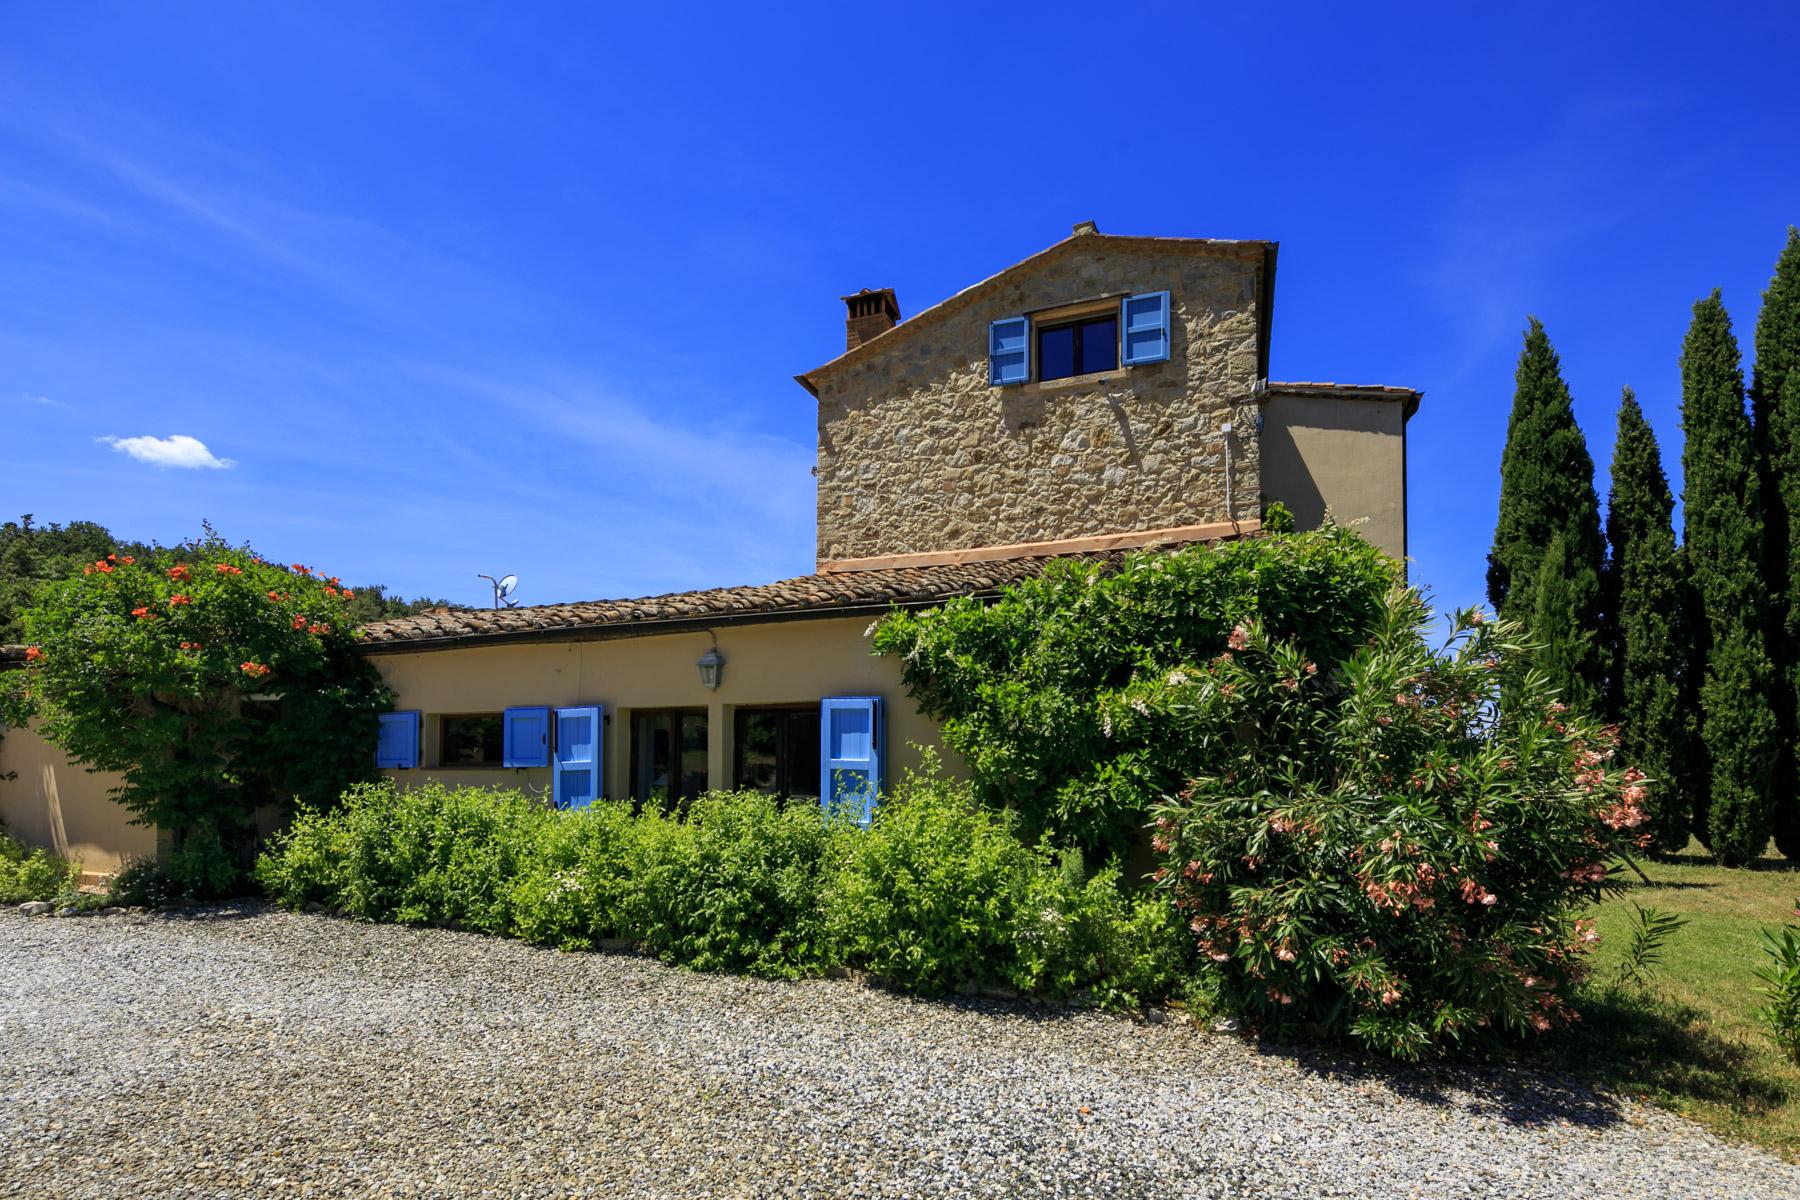 Villa in Vendita a Santa Luce: 5 locali, 270 mq - Foto 27